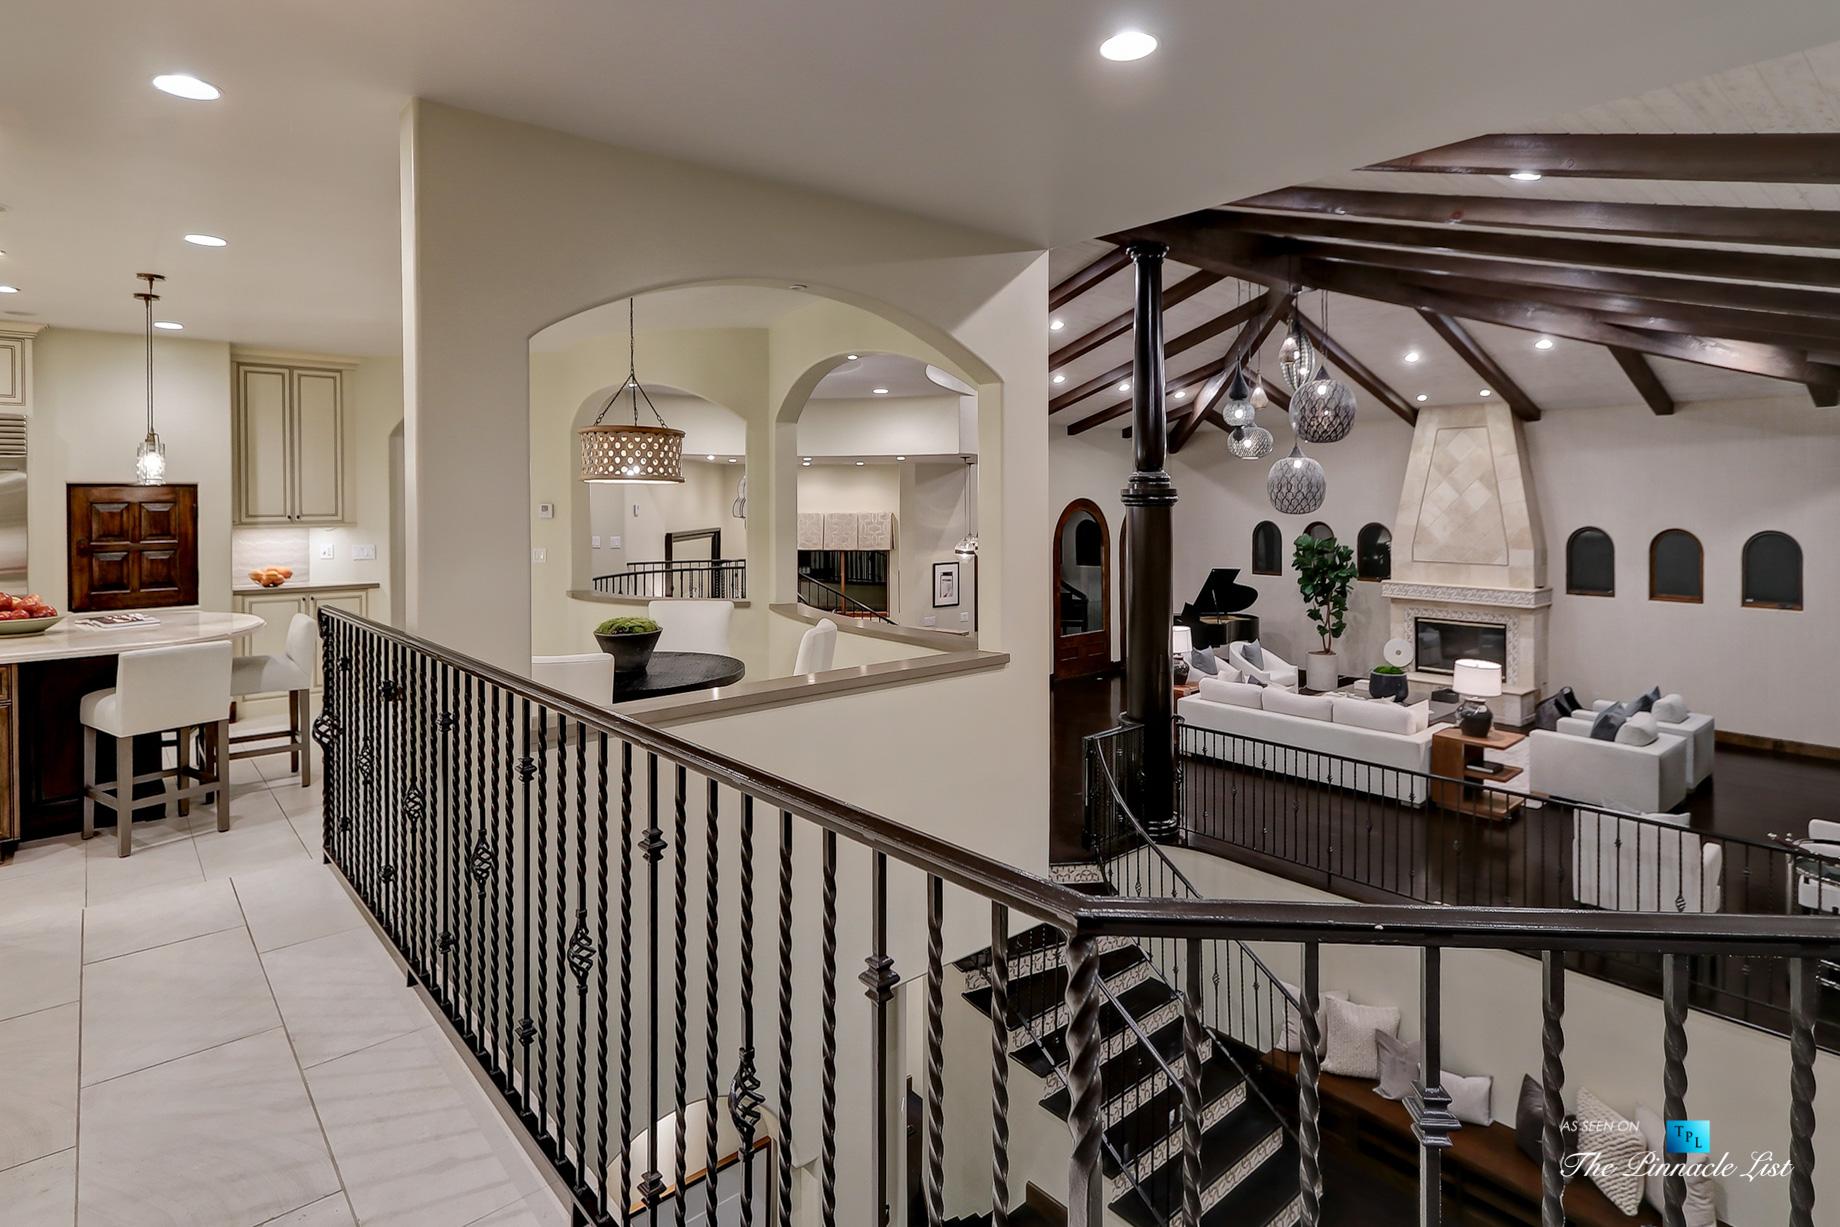 853 10th Street, Manhattan Beach, CA, USA – Night Kitchen and Living Room